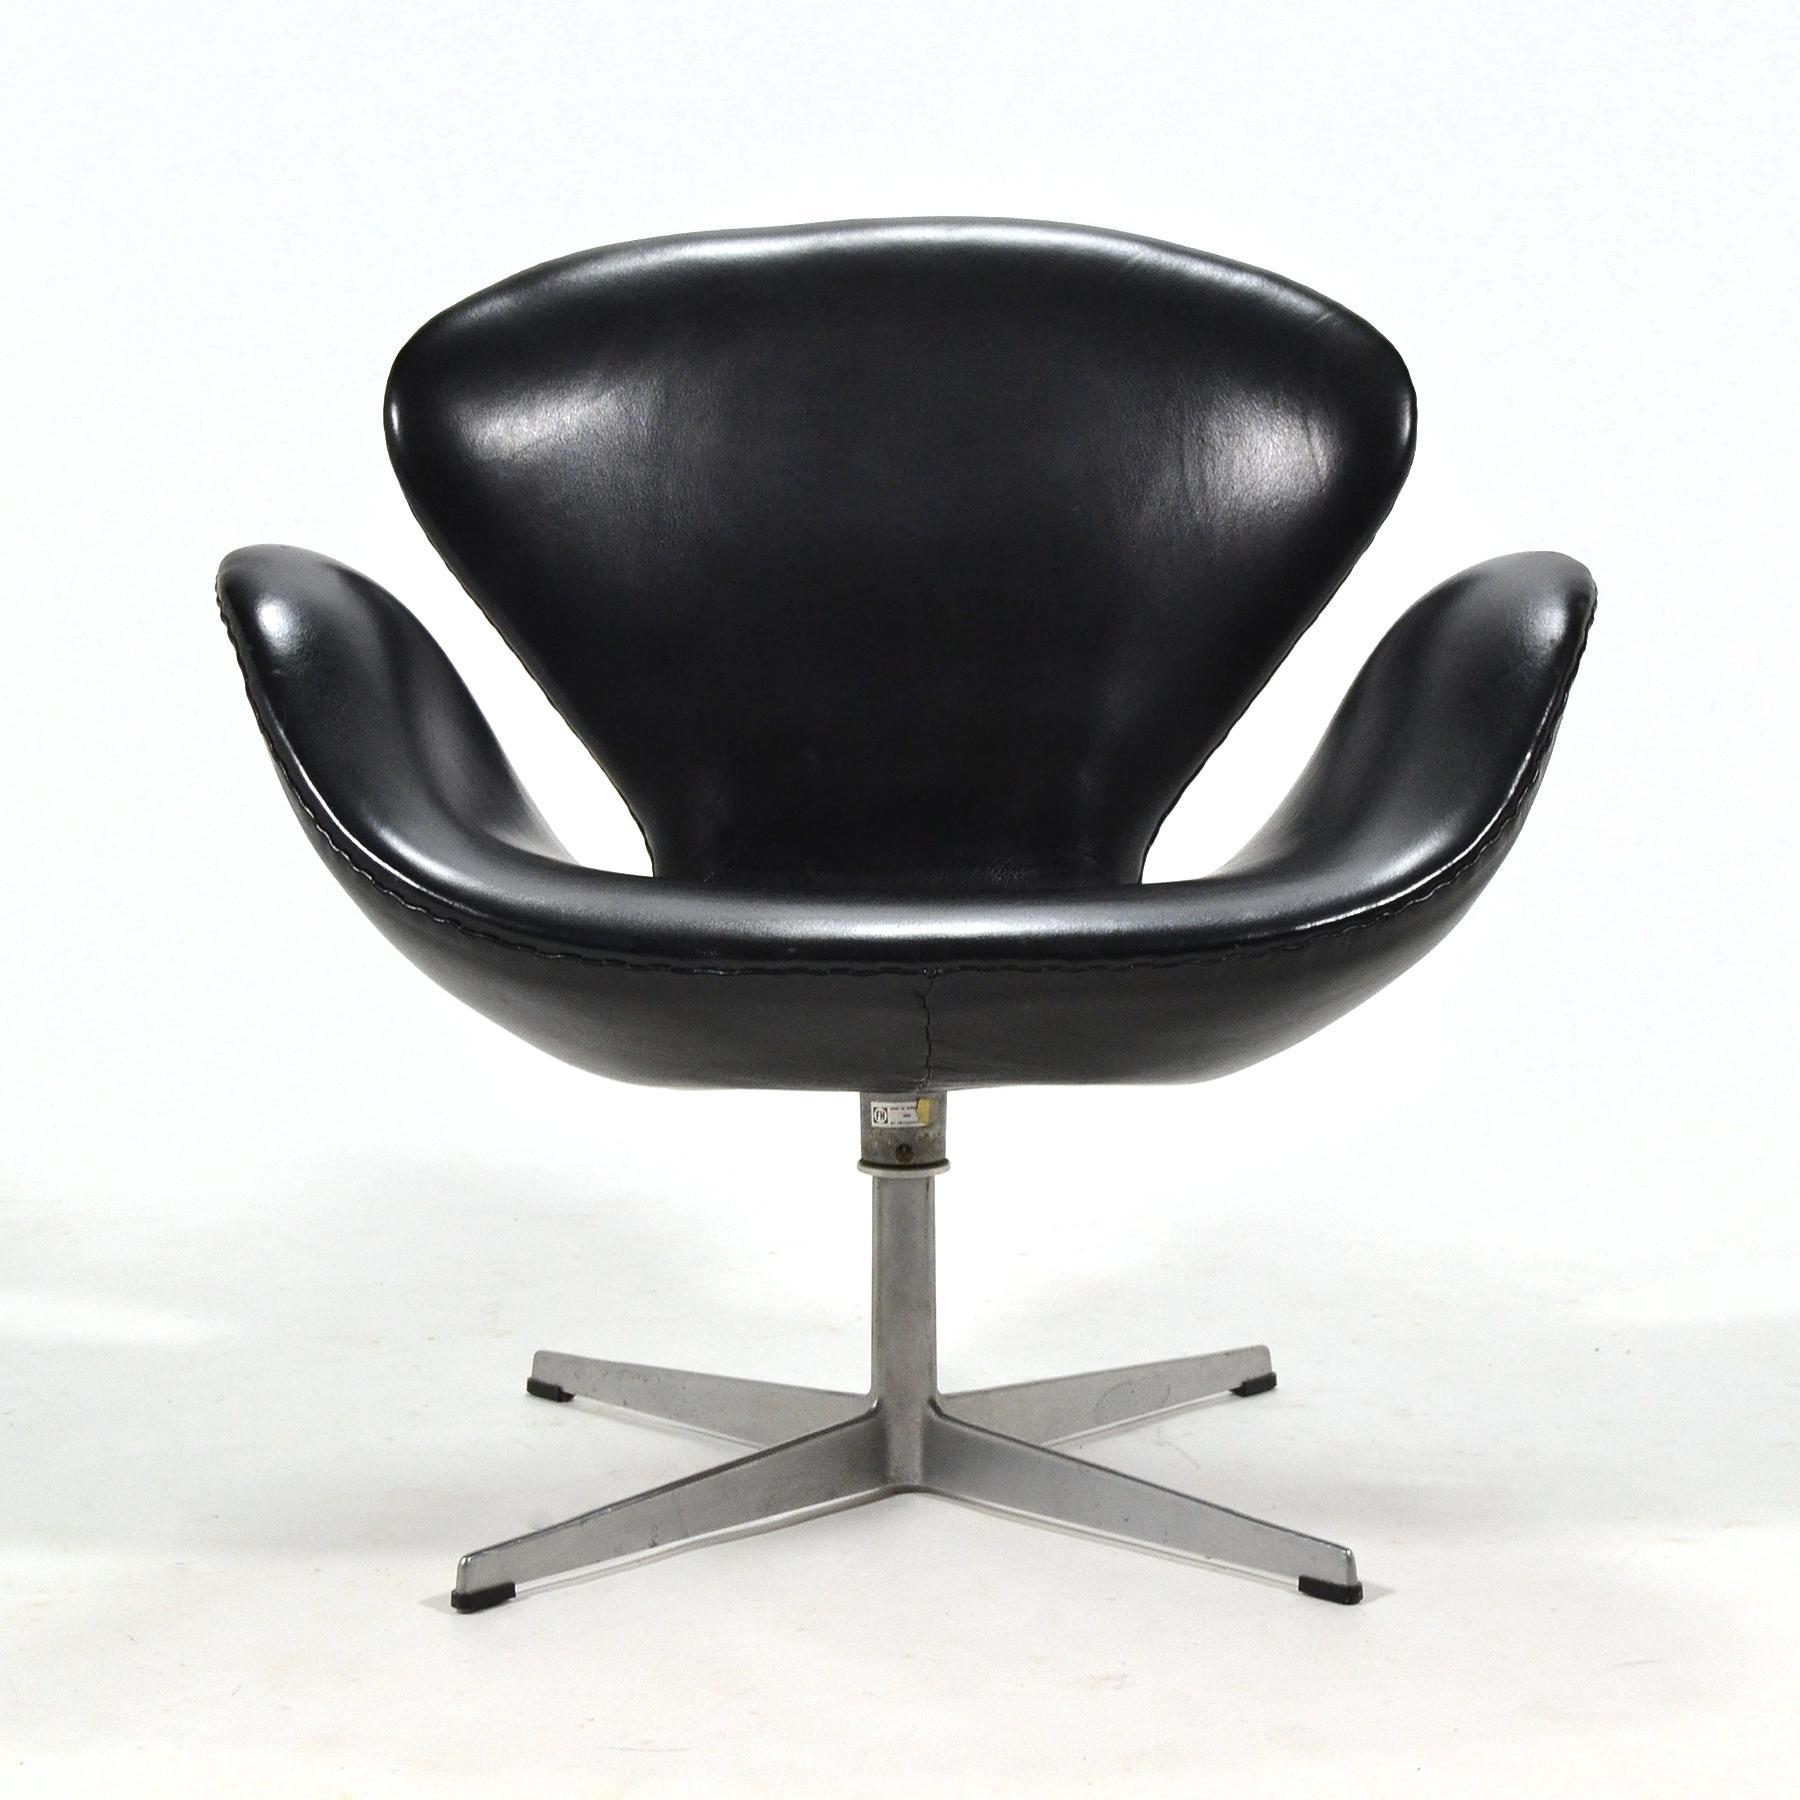 Superbe Mid Century Modern Arne Jacobsen Swan Chair In Black Leather By Fritz  Hansen For Sale